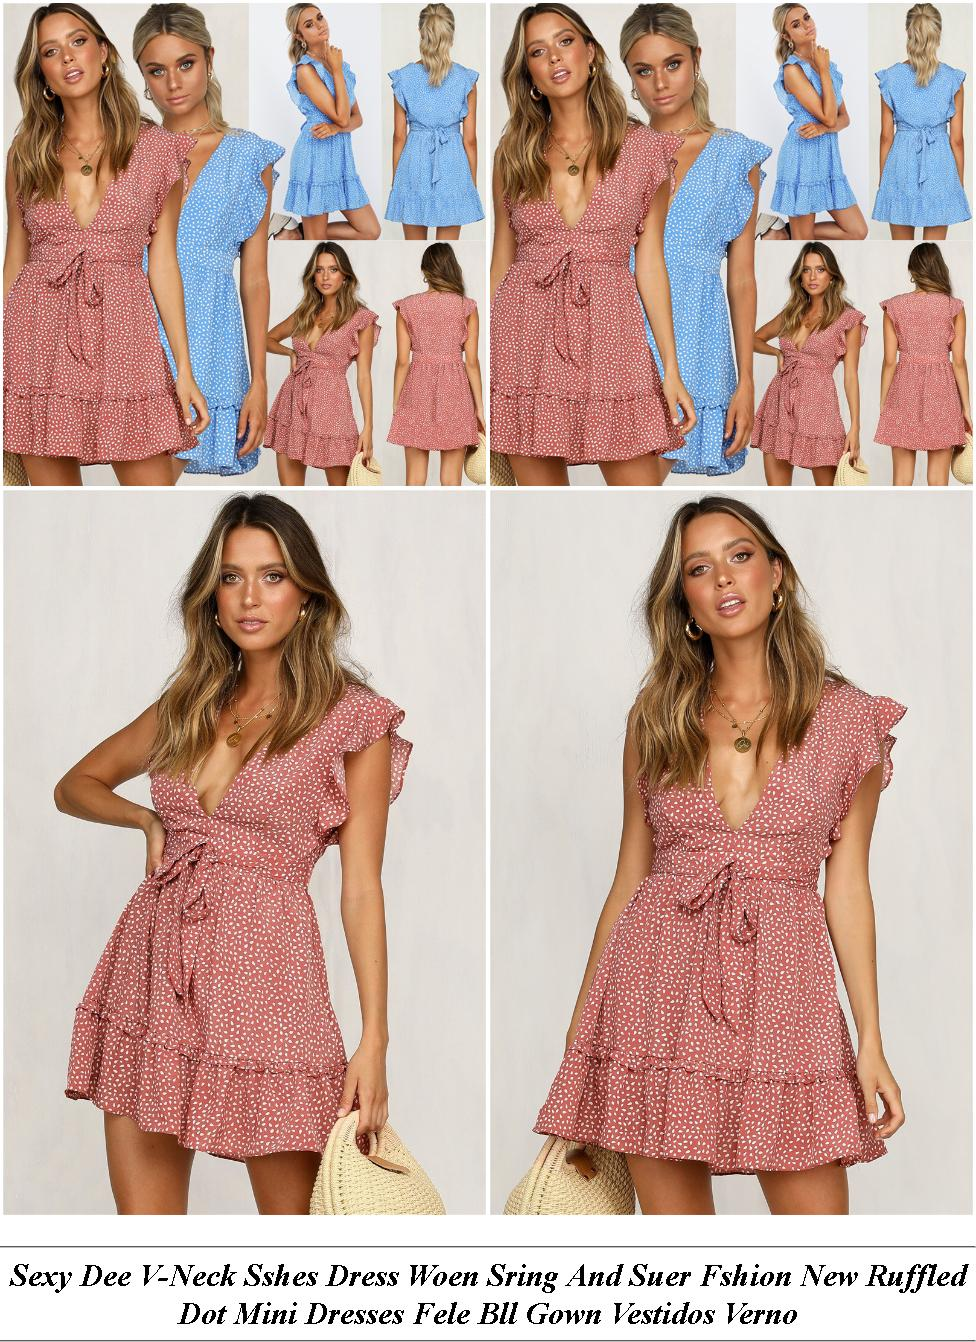 Long Semi Formal Dresses For Juniors - Ridal Shops Salem Va - Floral Fashion Trend